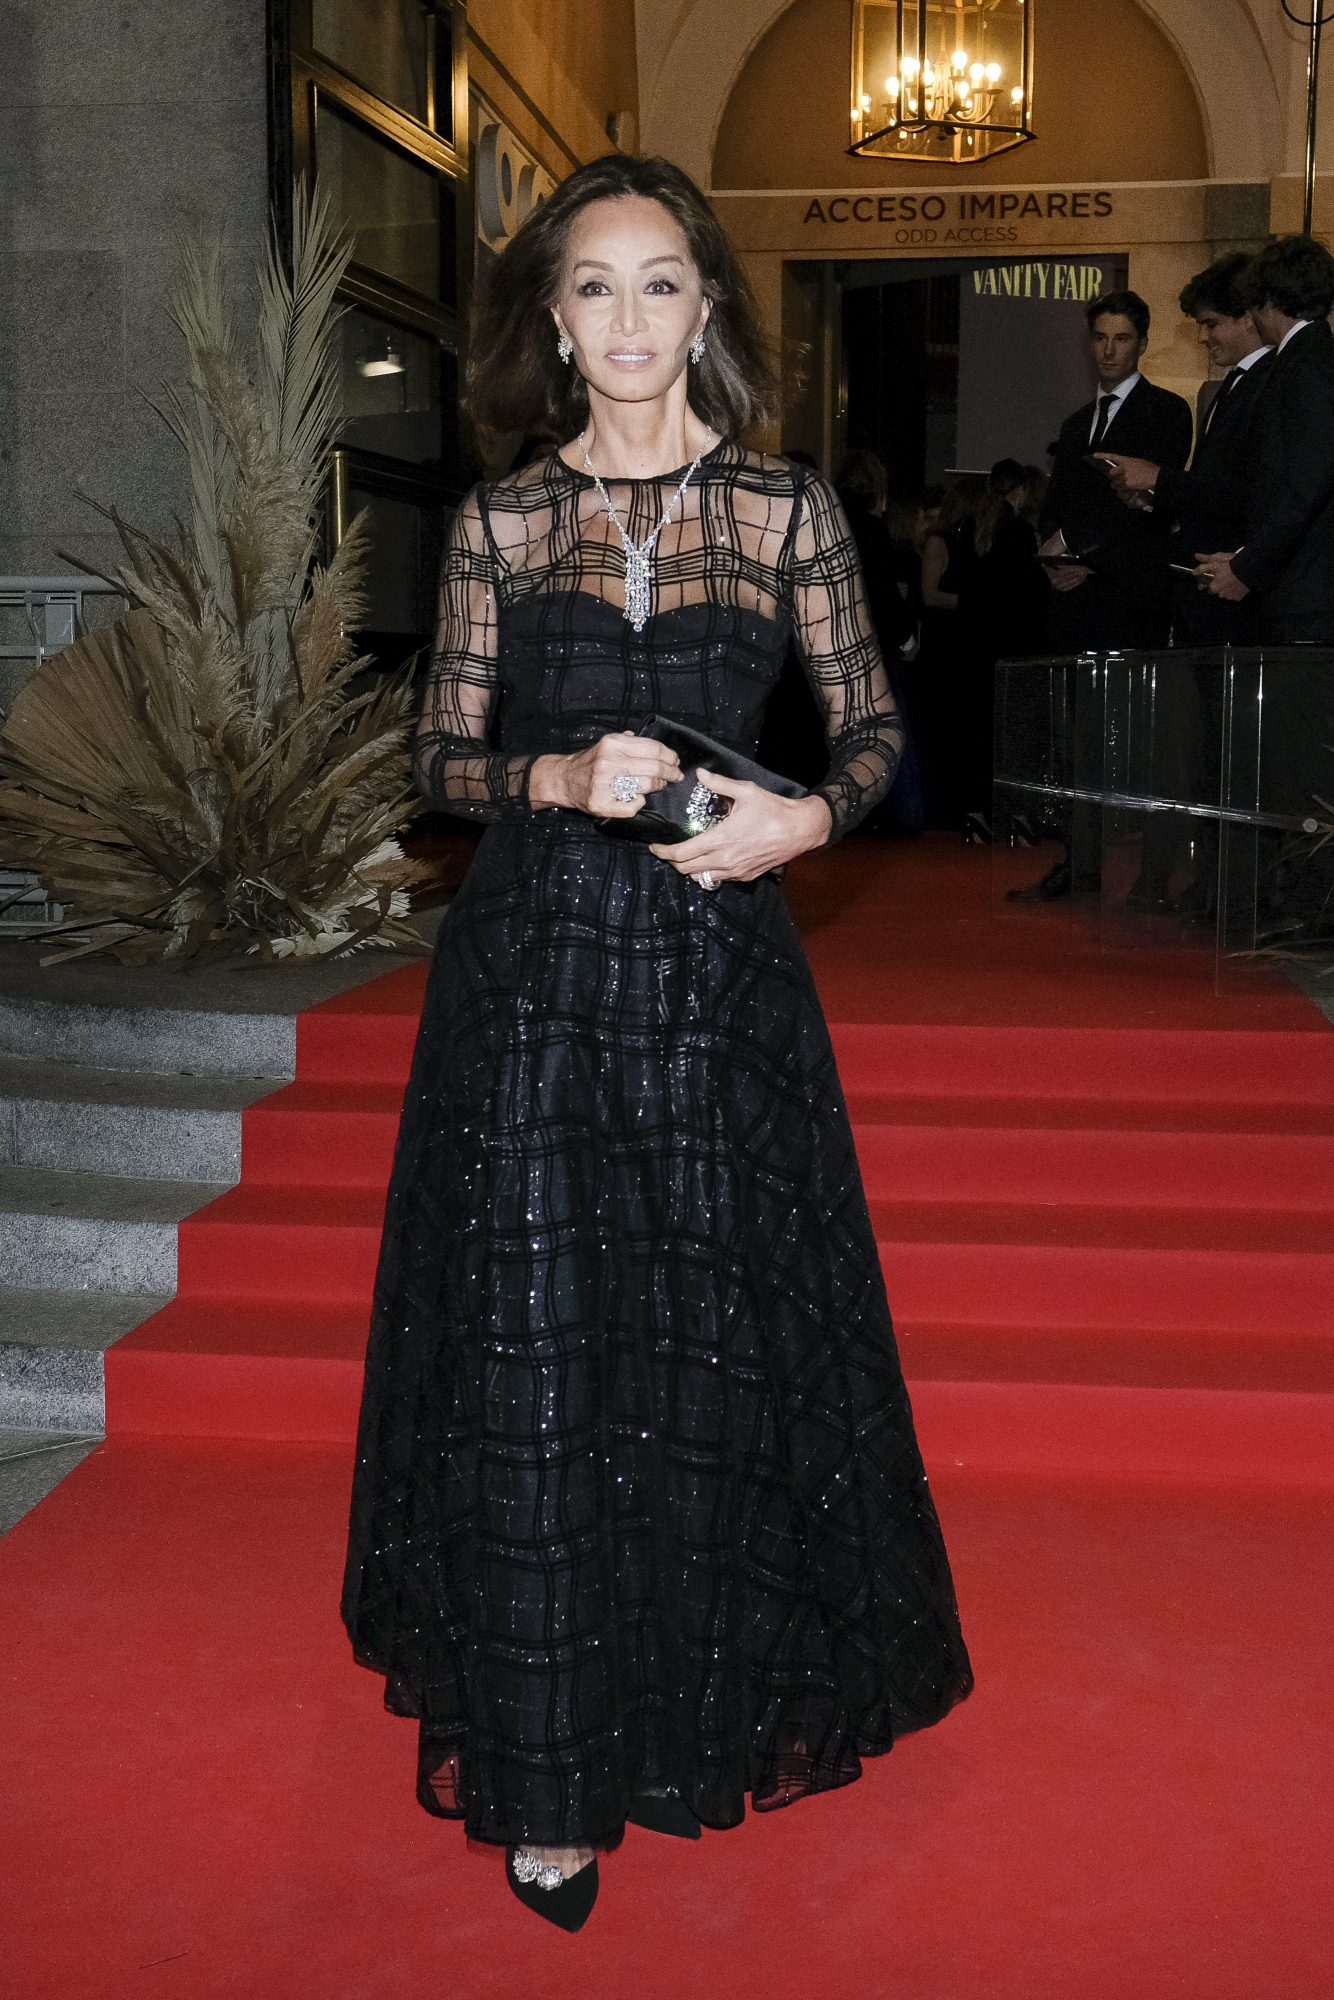 Vanity Fair Personality Of Year Awards 2019 In Madrid